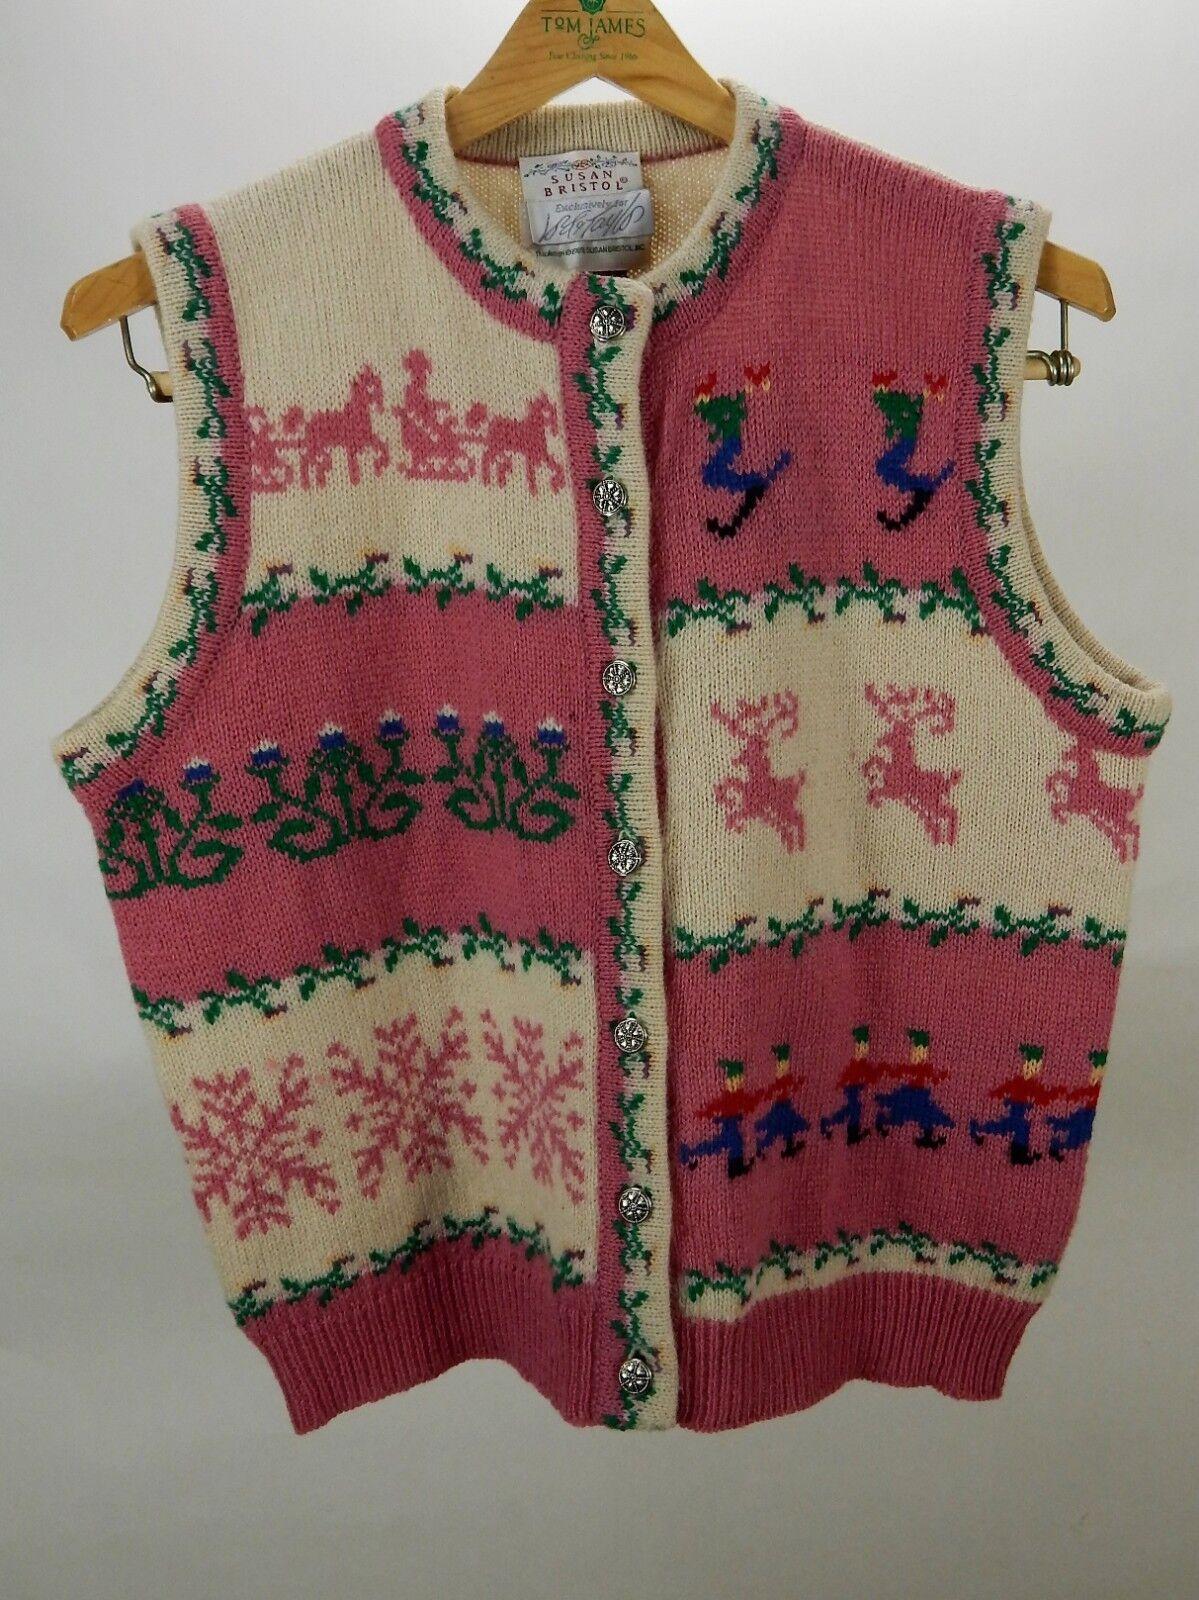 Vintage 1989 Susan Bristol 100% Shetland Wool Christmas Vest Size M